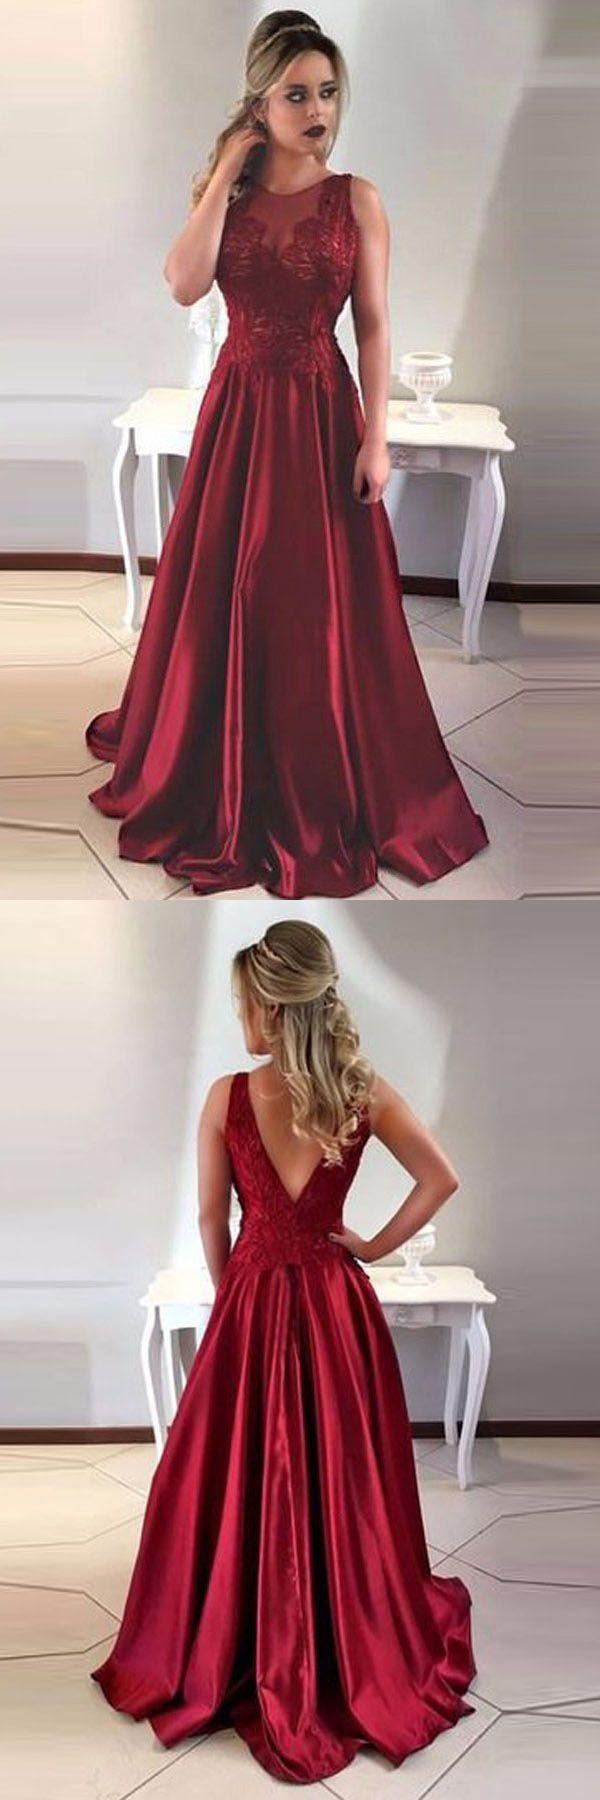 Customized colorful prom dresses aline round neck vback maroon